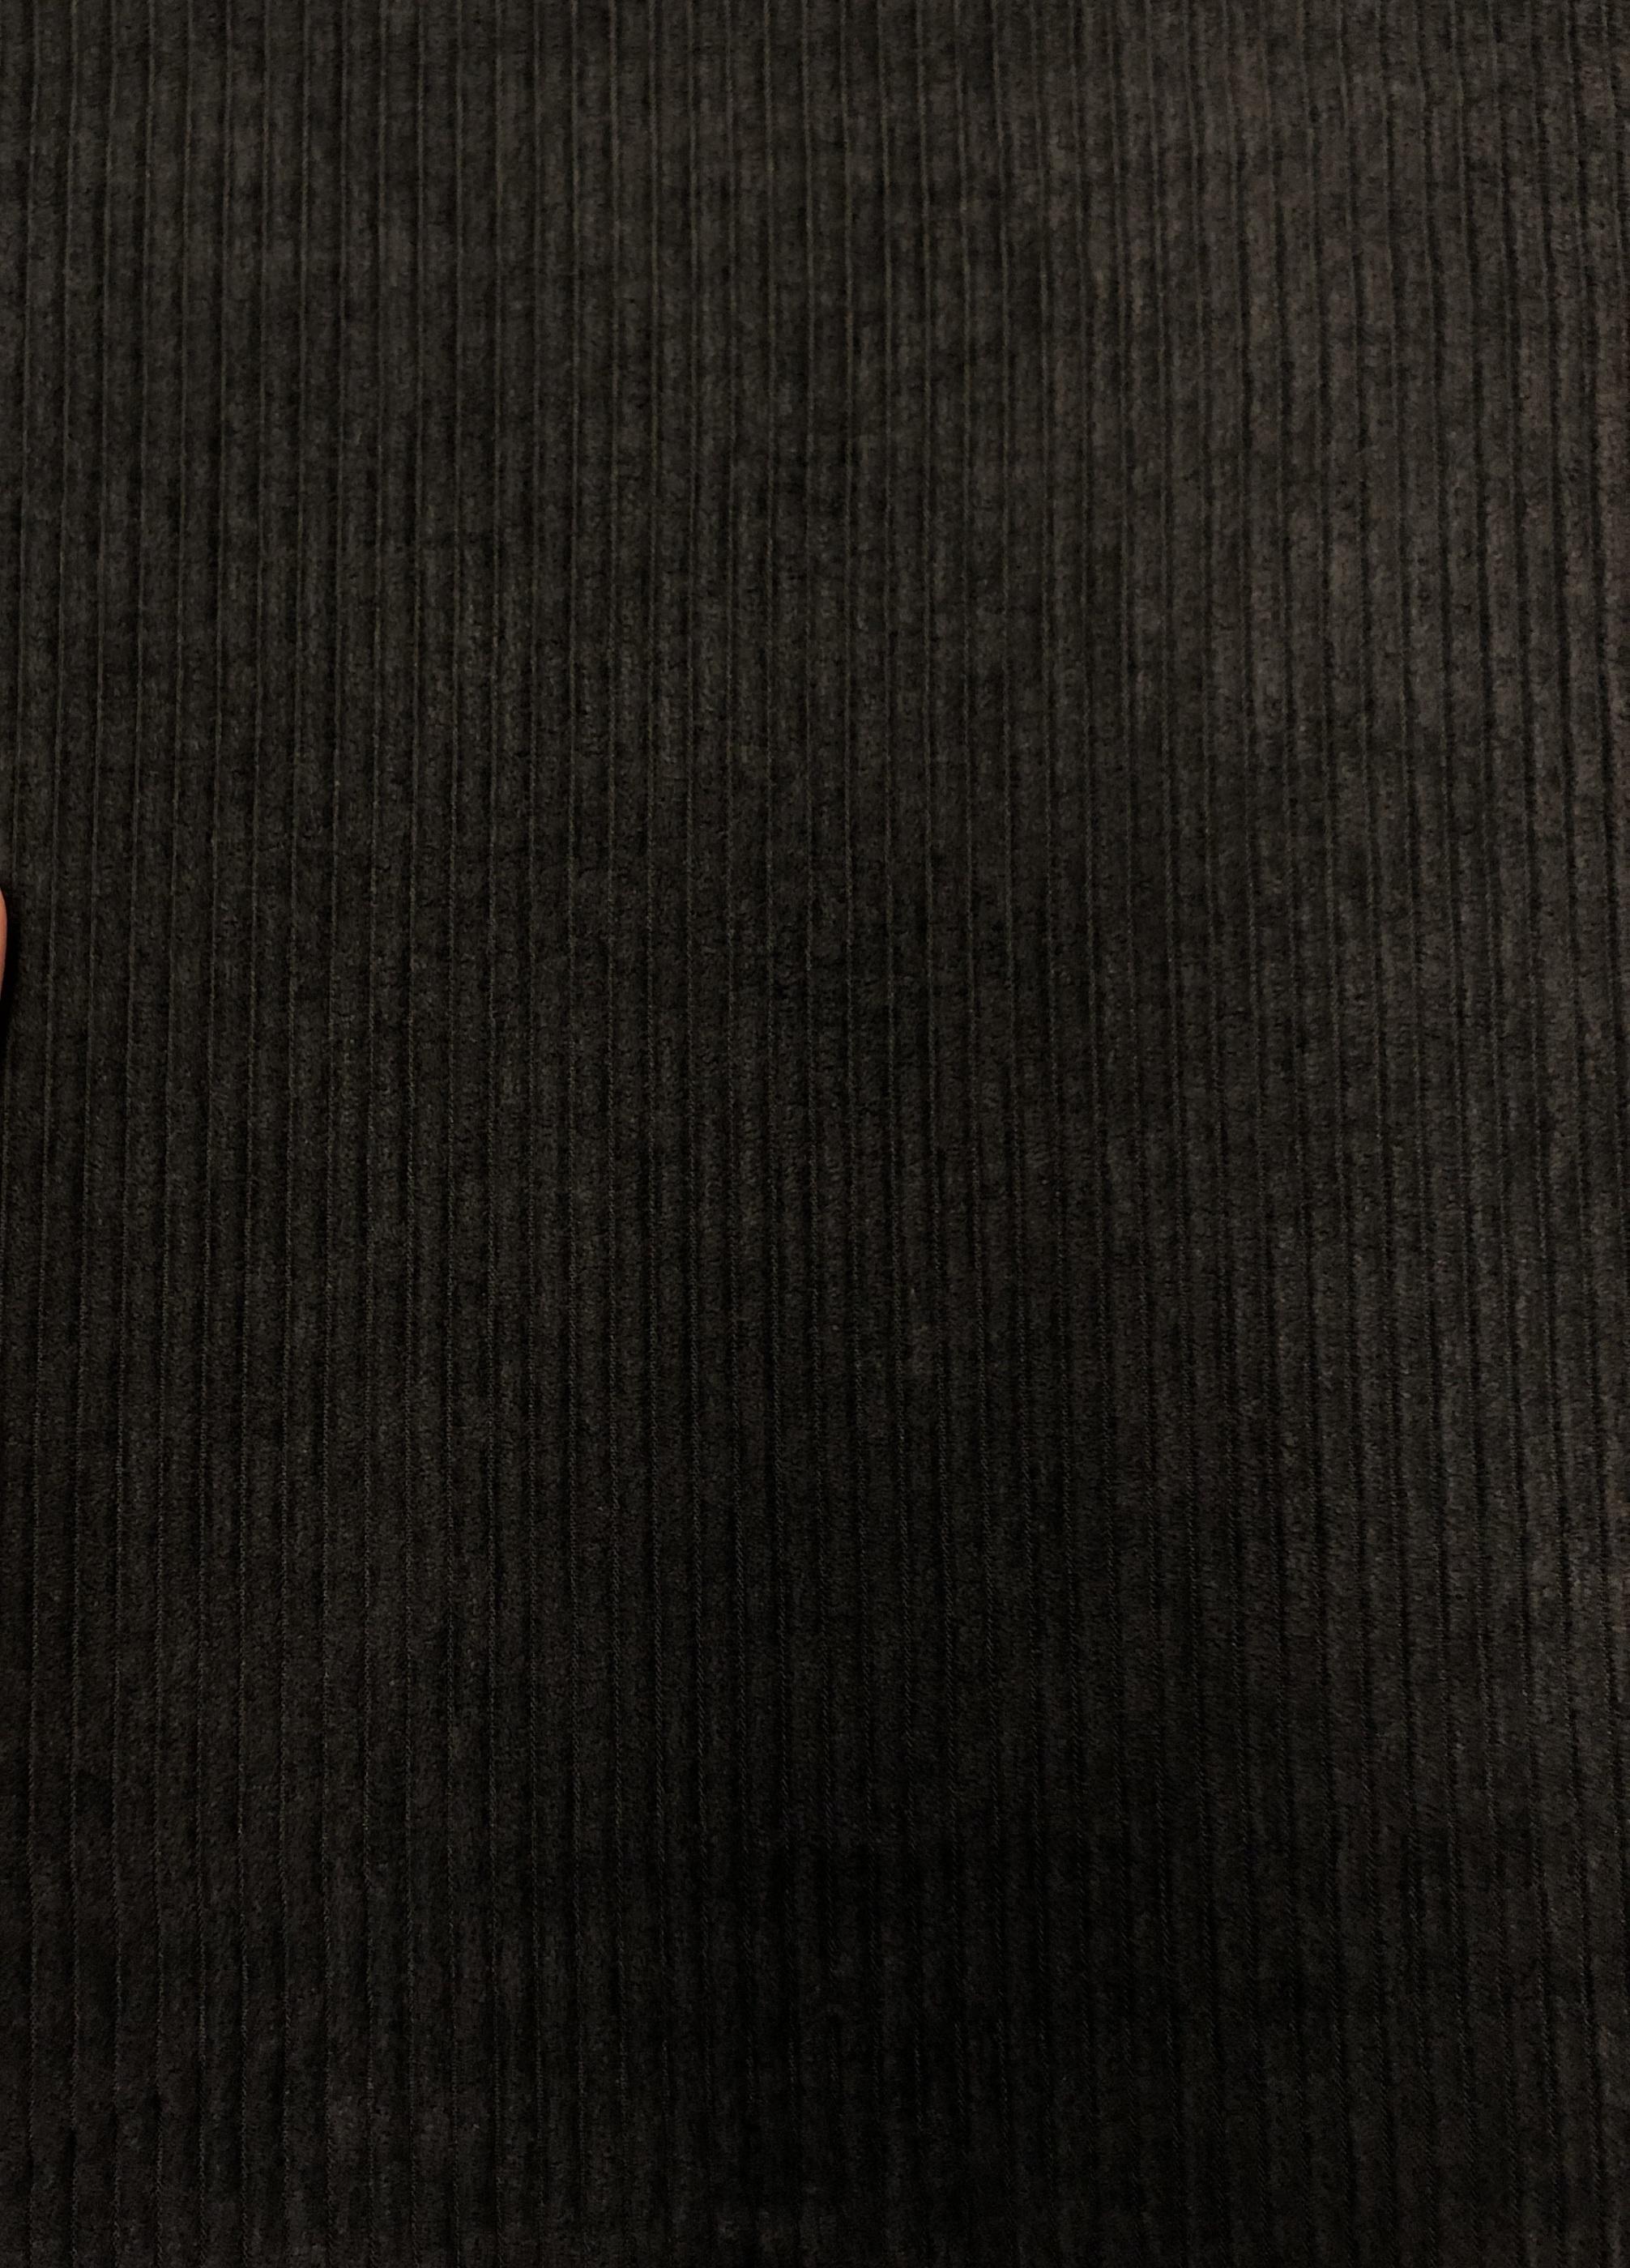 manchester metervara modetyg laholm tyglust svart